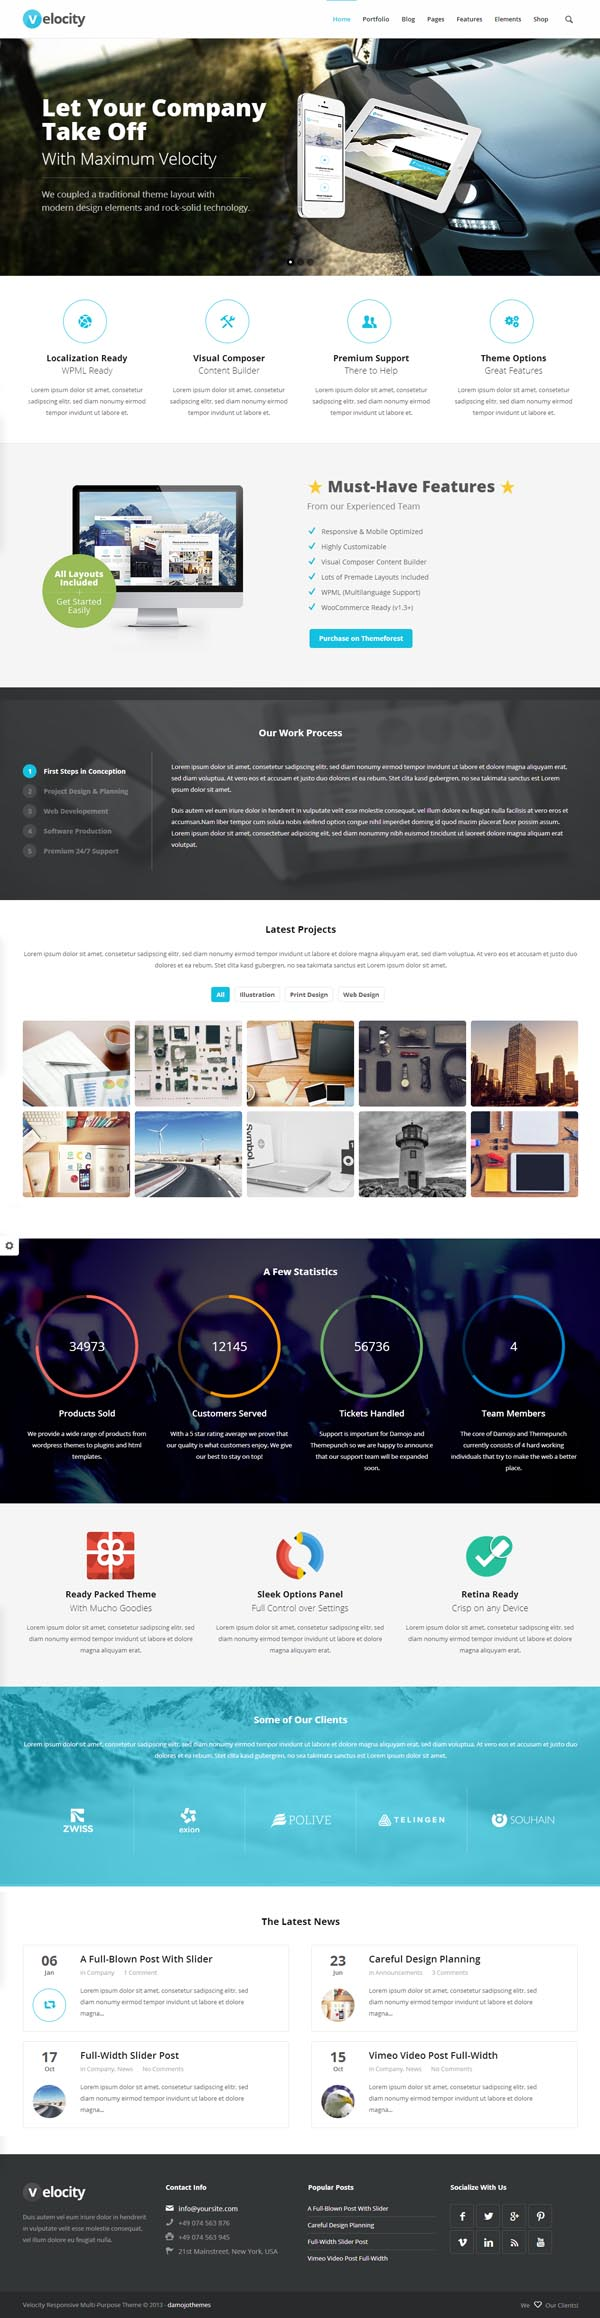 Velocity - Responsive Multi-Purpose WordPress Theme